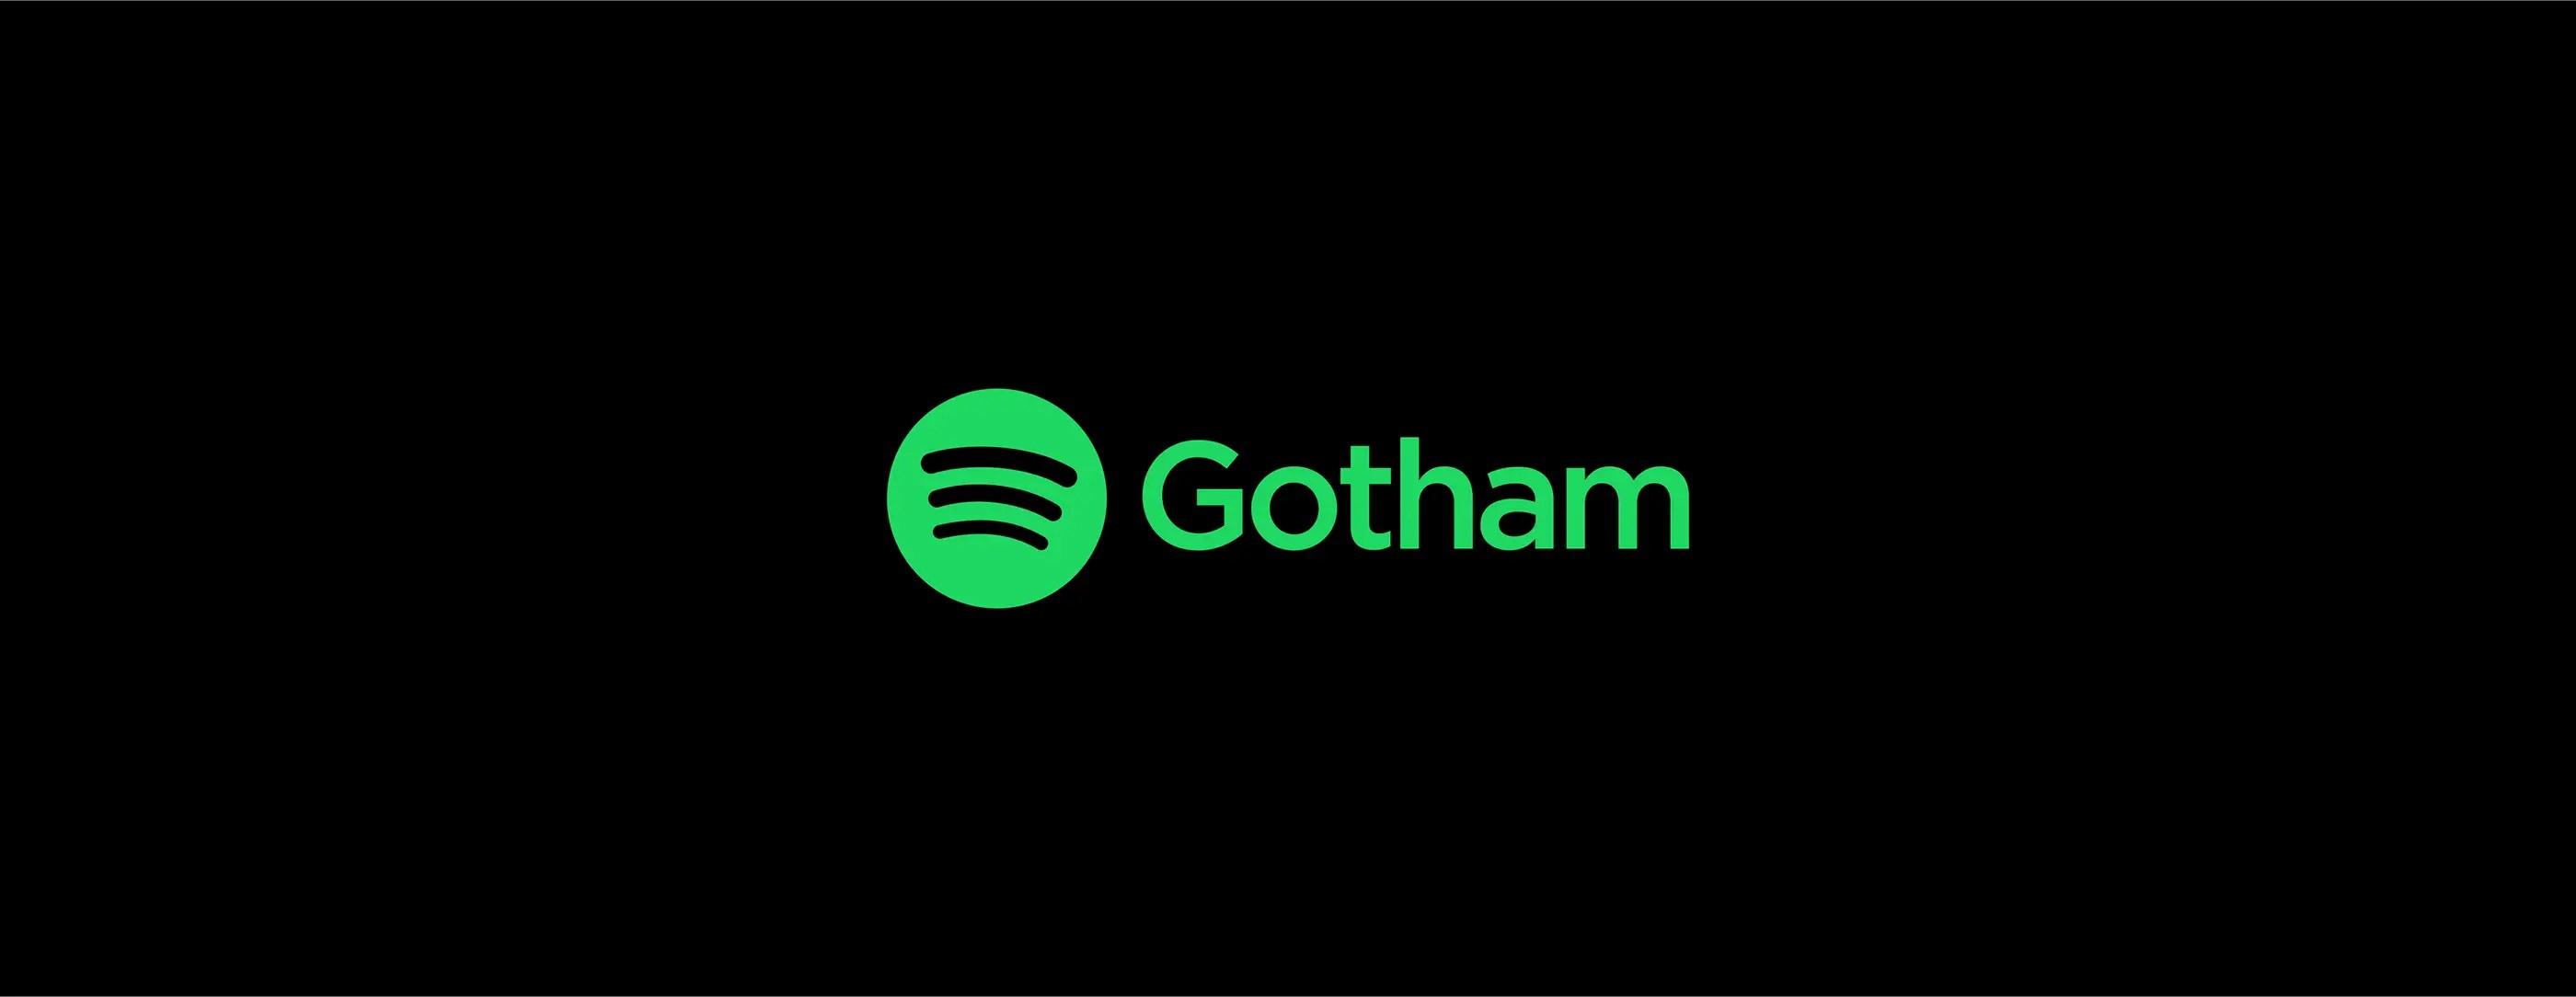 wersm-logo-font-spotify-gotham